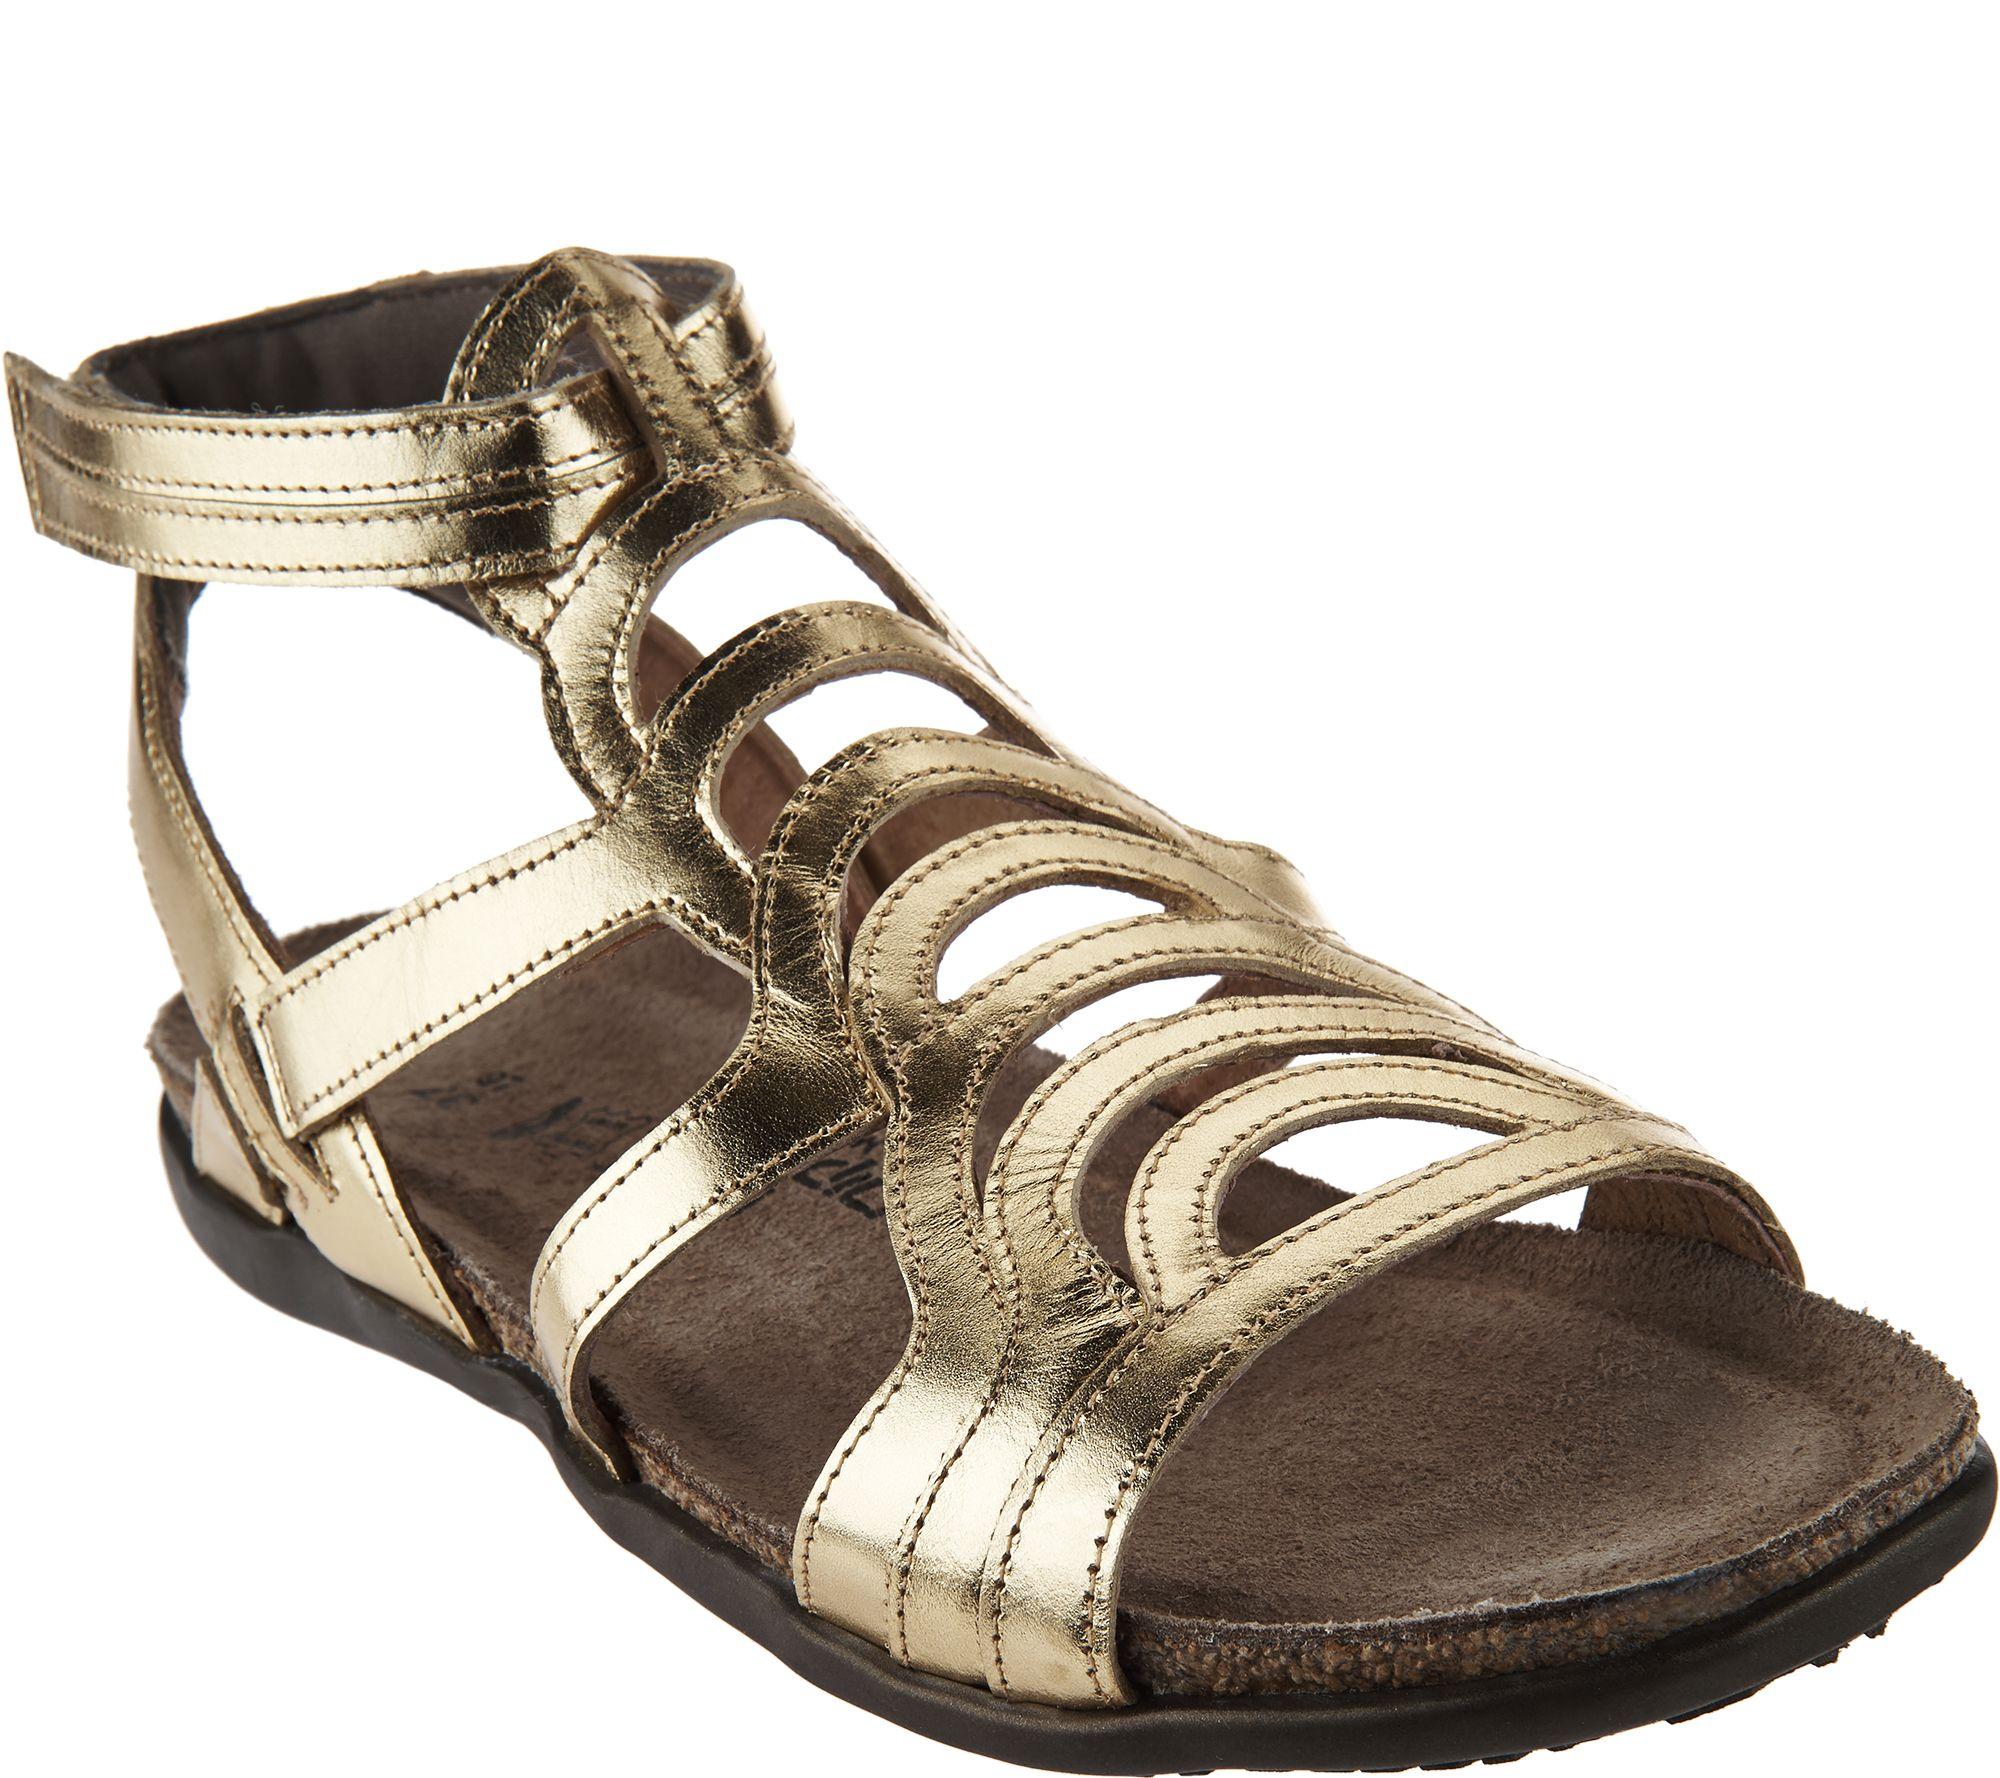 6f211fd745fa Naot Leather Gladiator Sandals - Sara - Page 1 — QVC.com